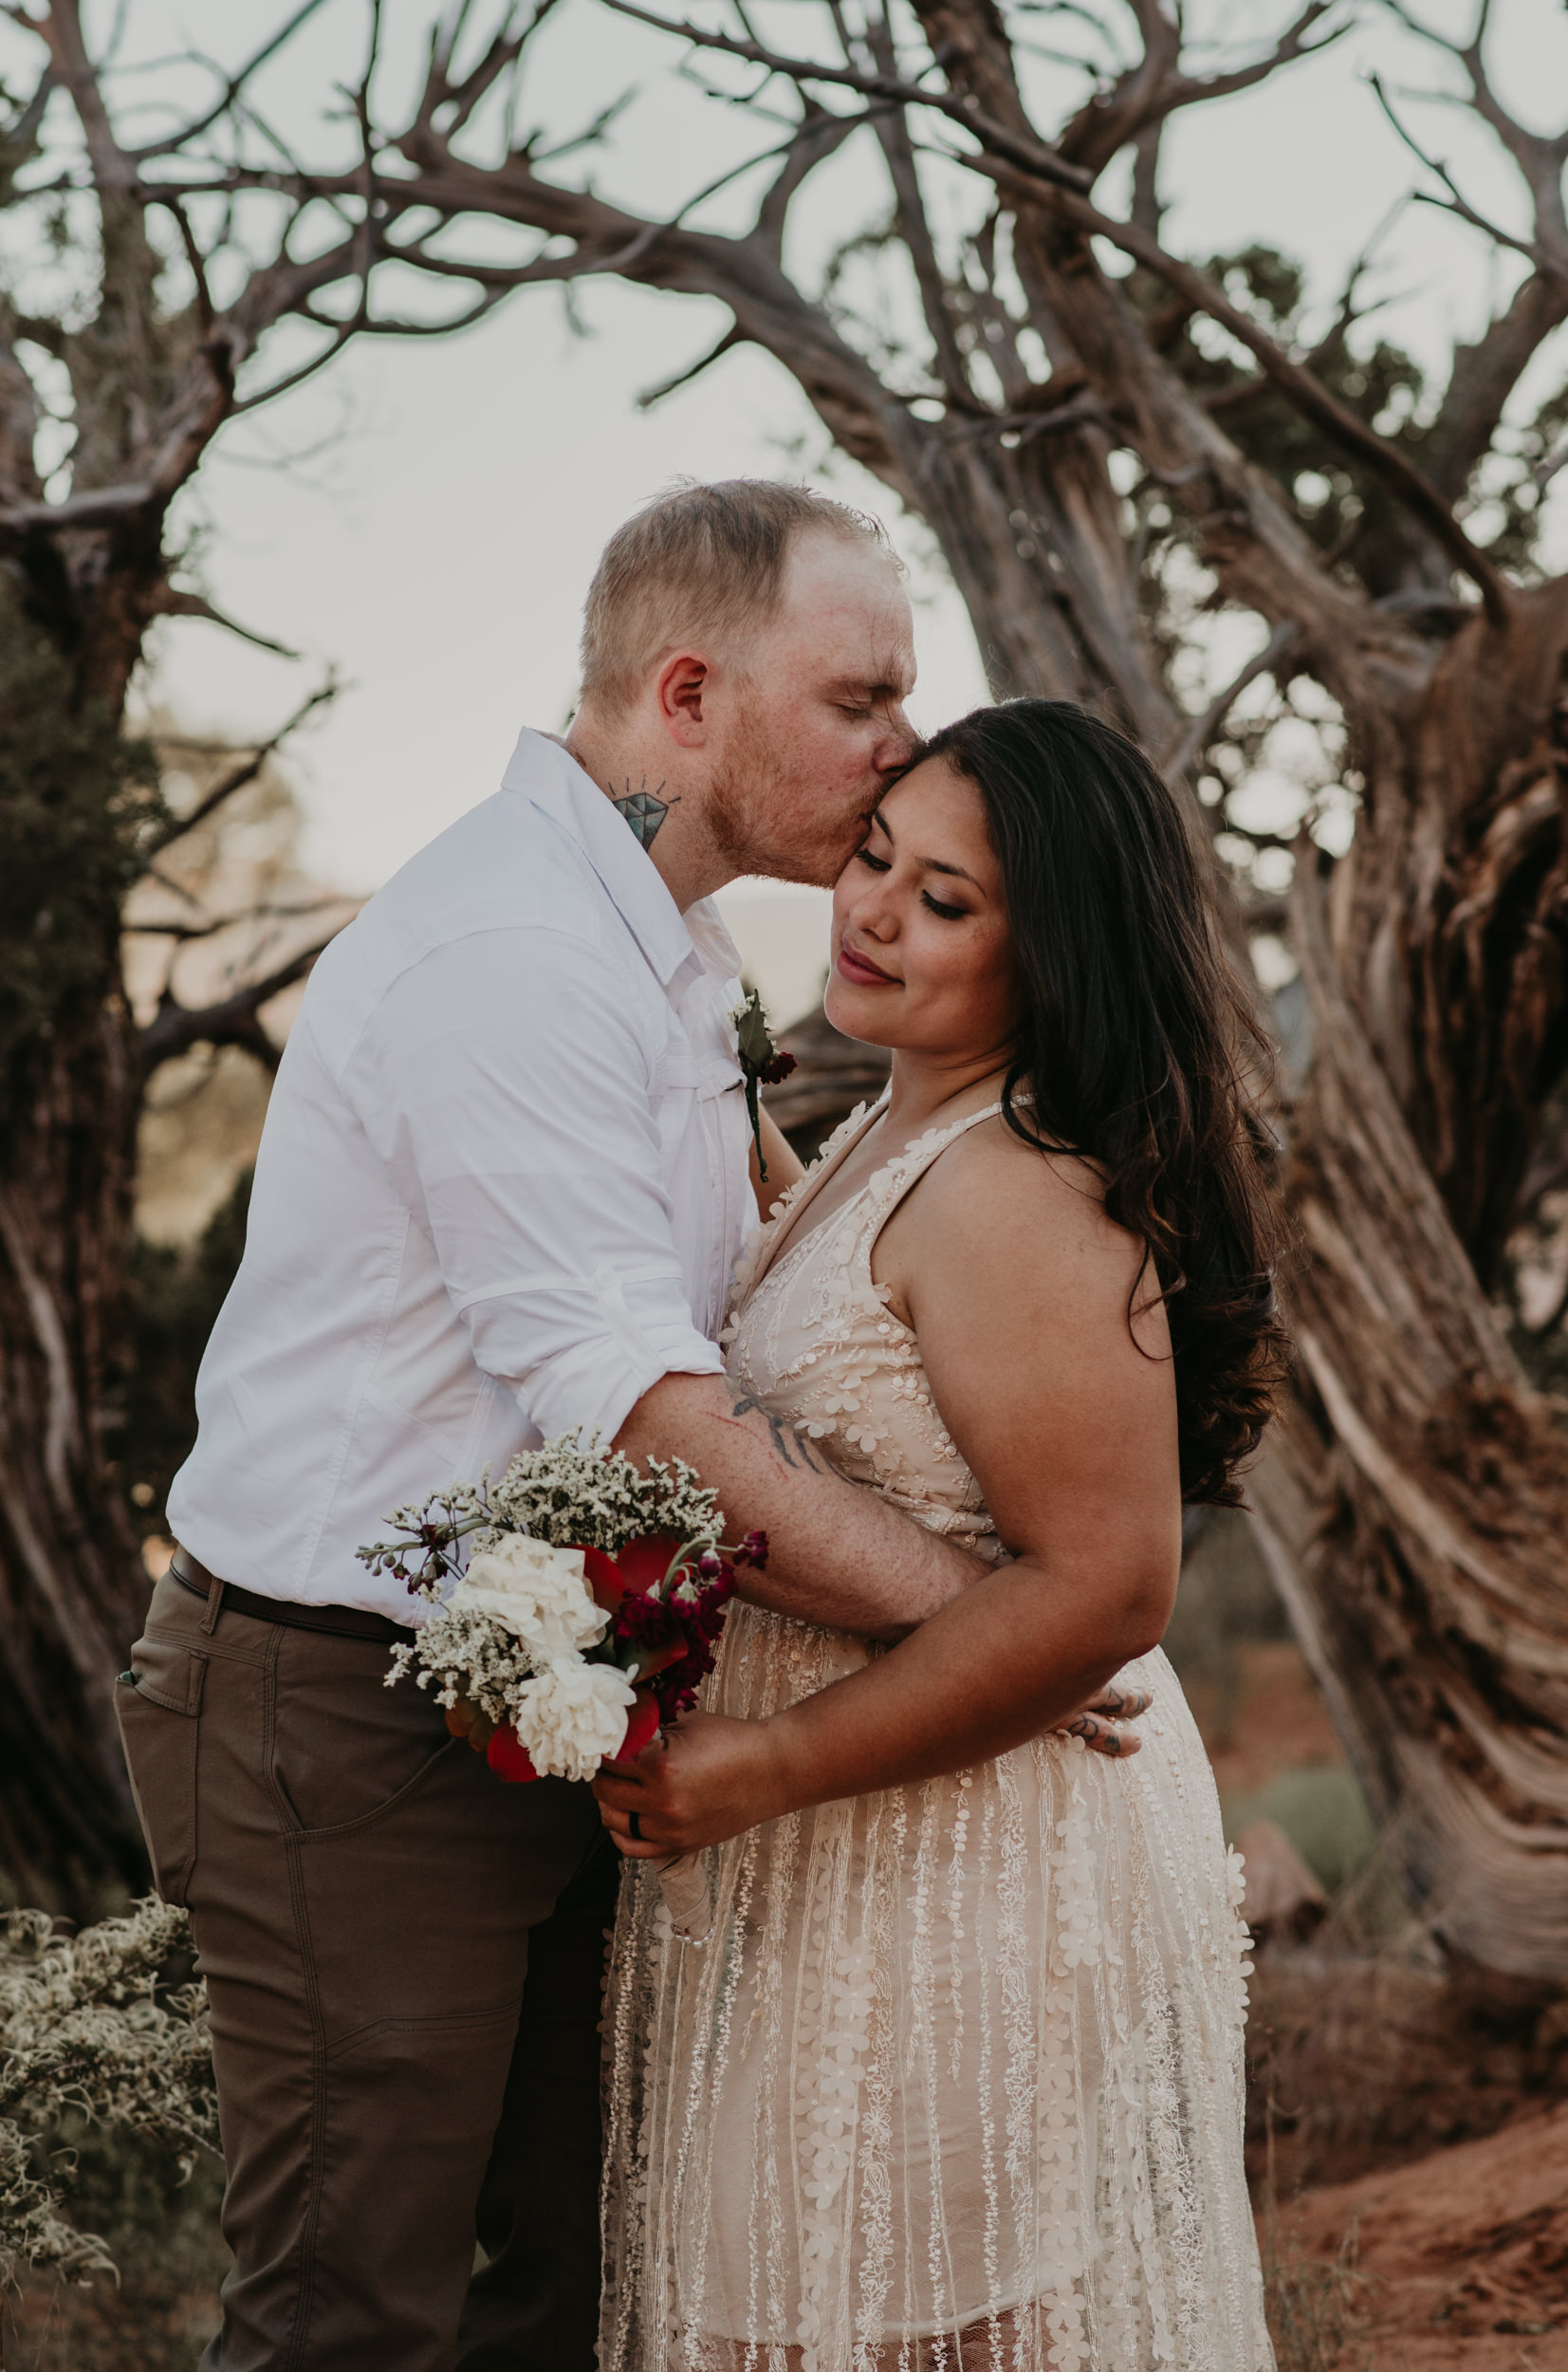 Arches National Park elopement. Delicate Arch wedding.